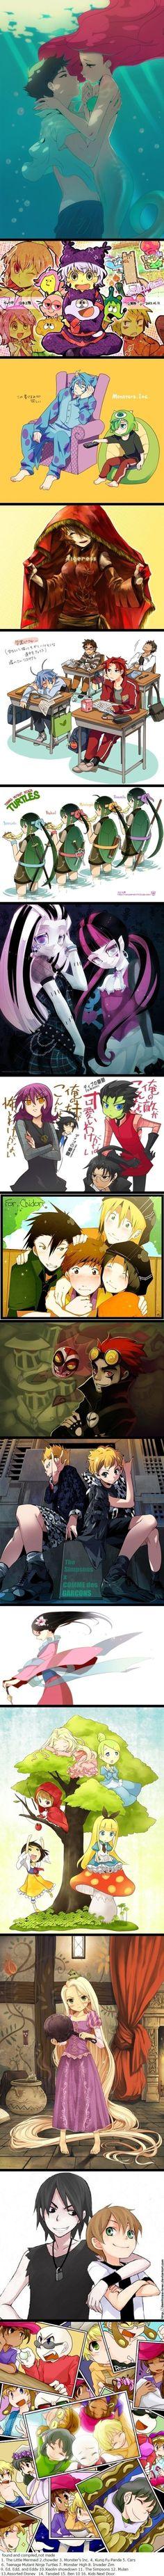 Cartoons -- Anime 2